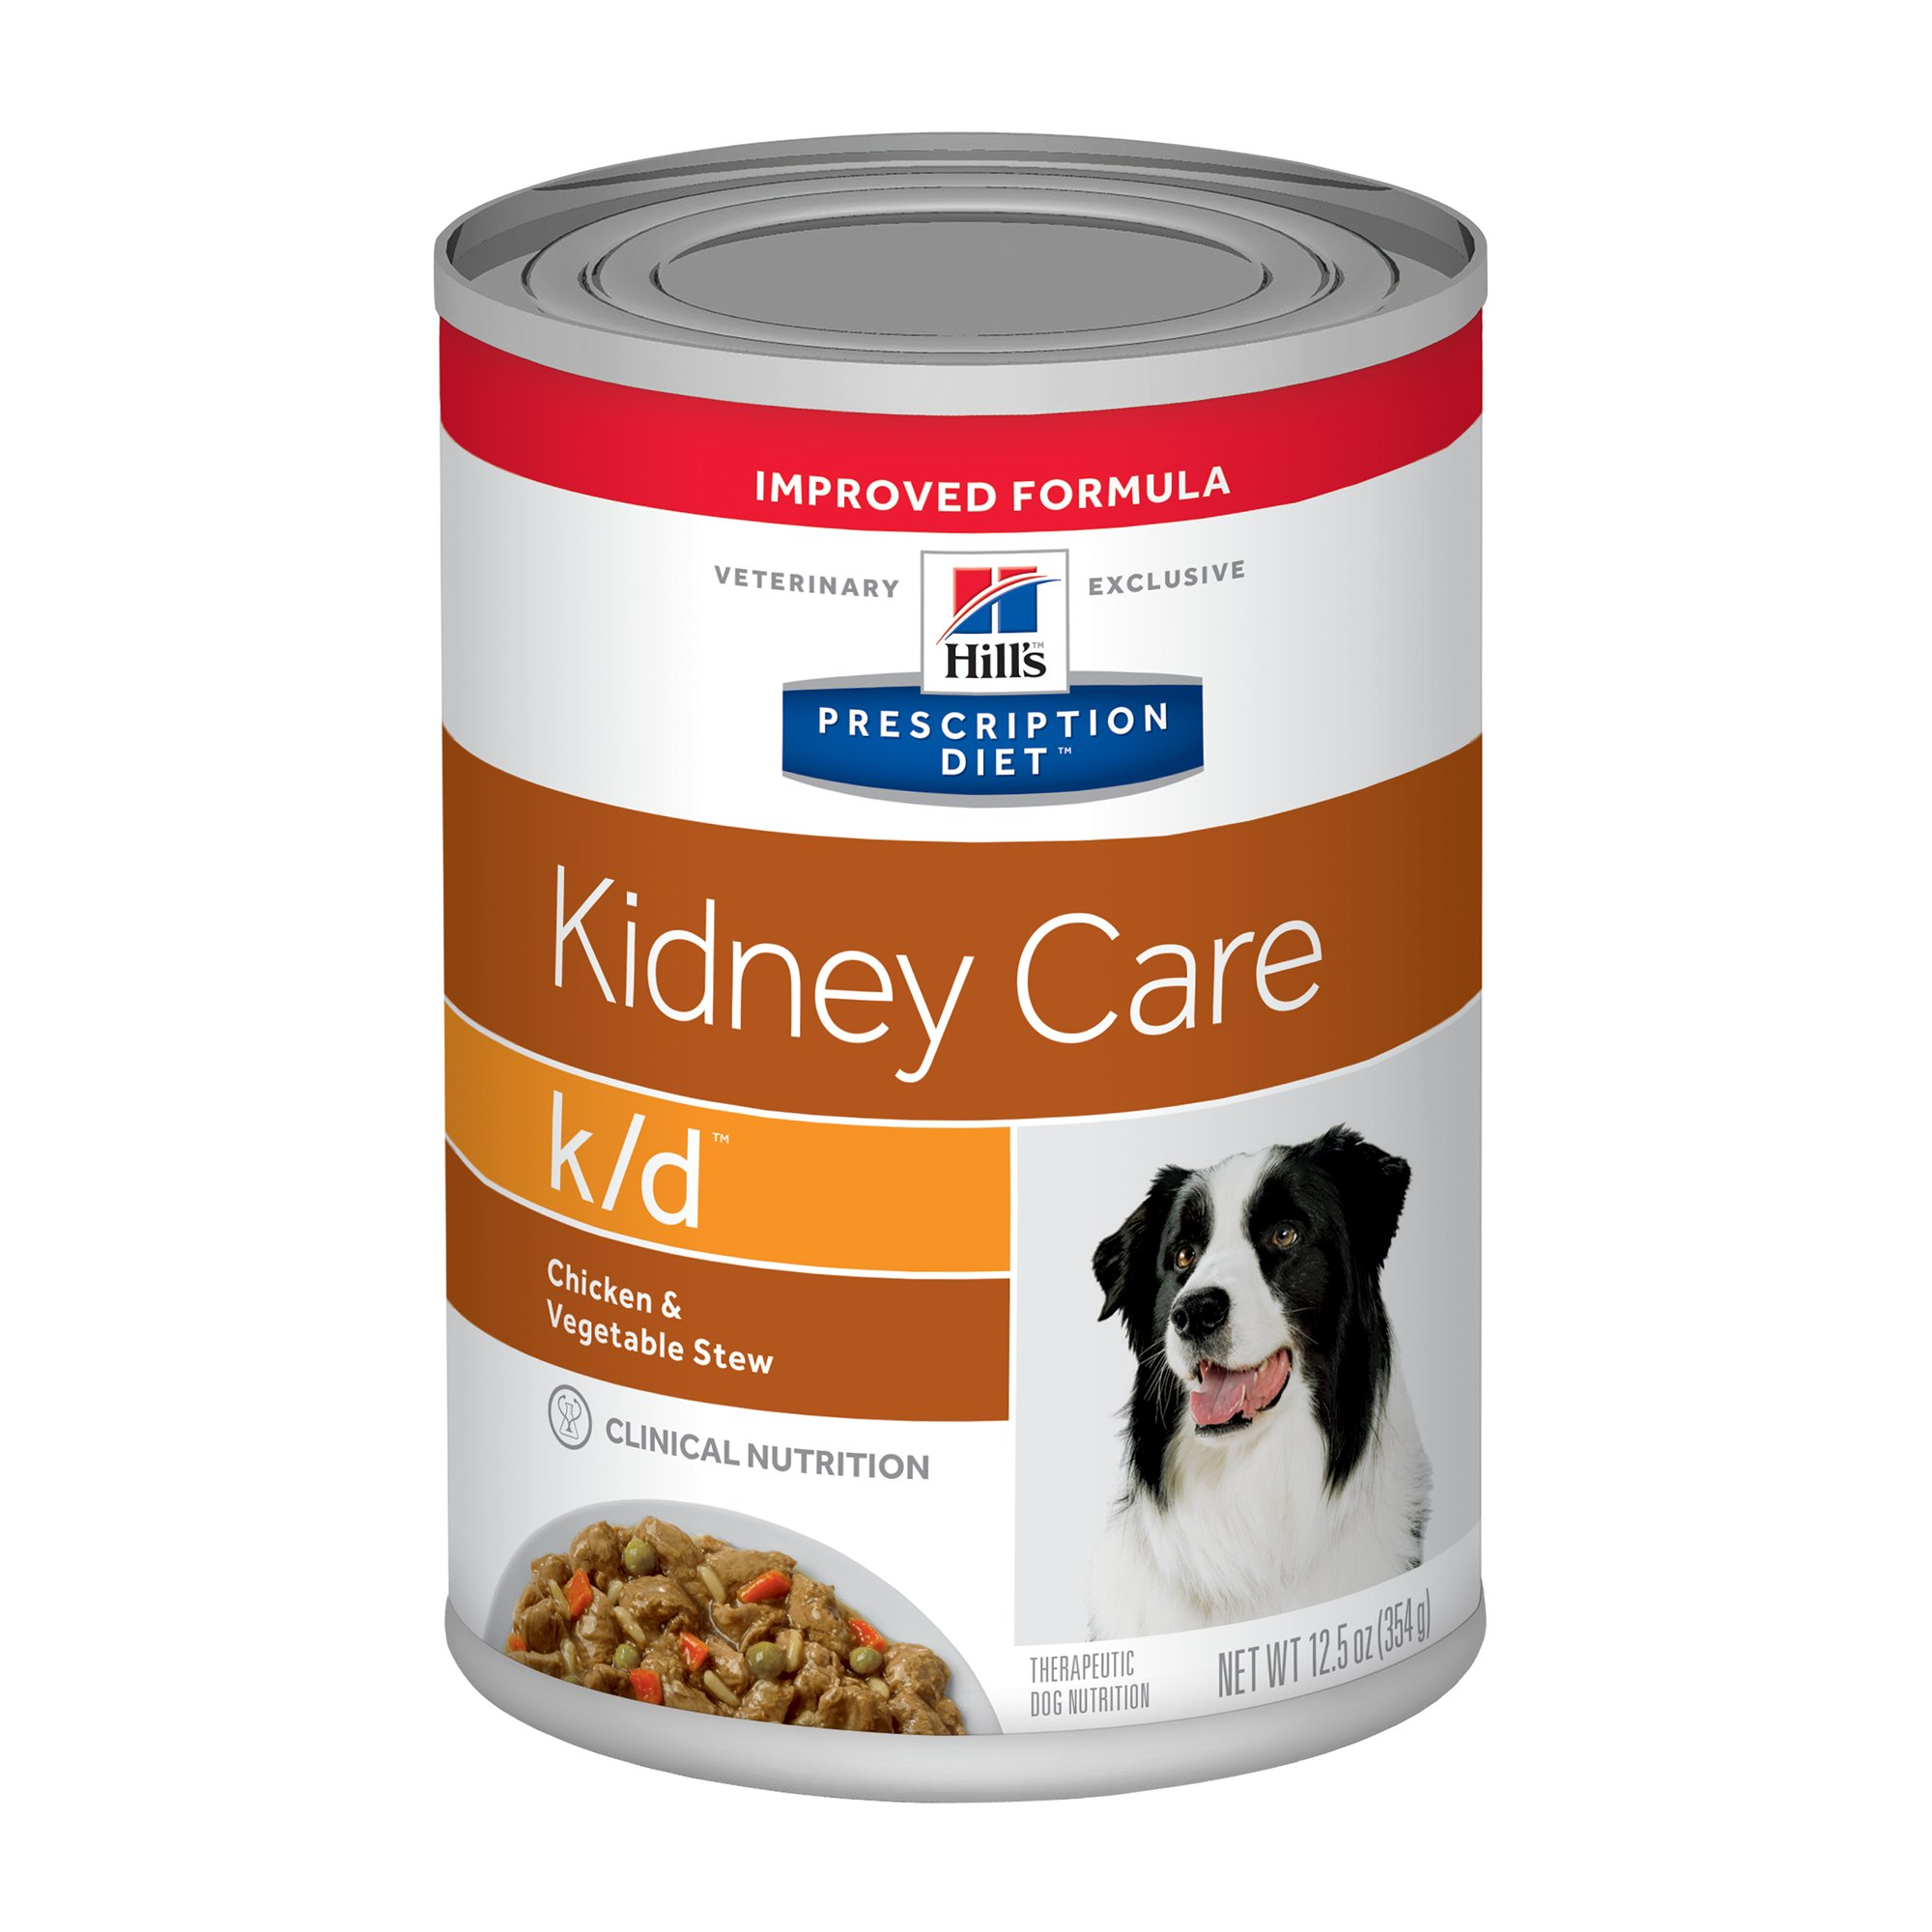 Hill's Prescription Diet K/d Kidney Care Beef & Vegetable